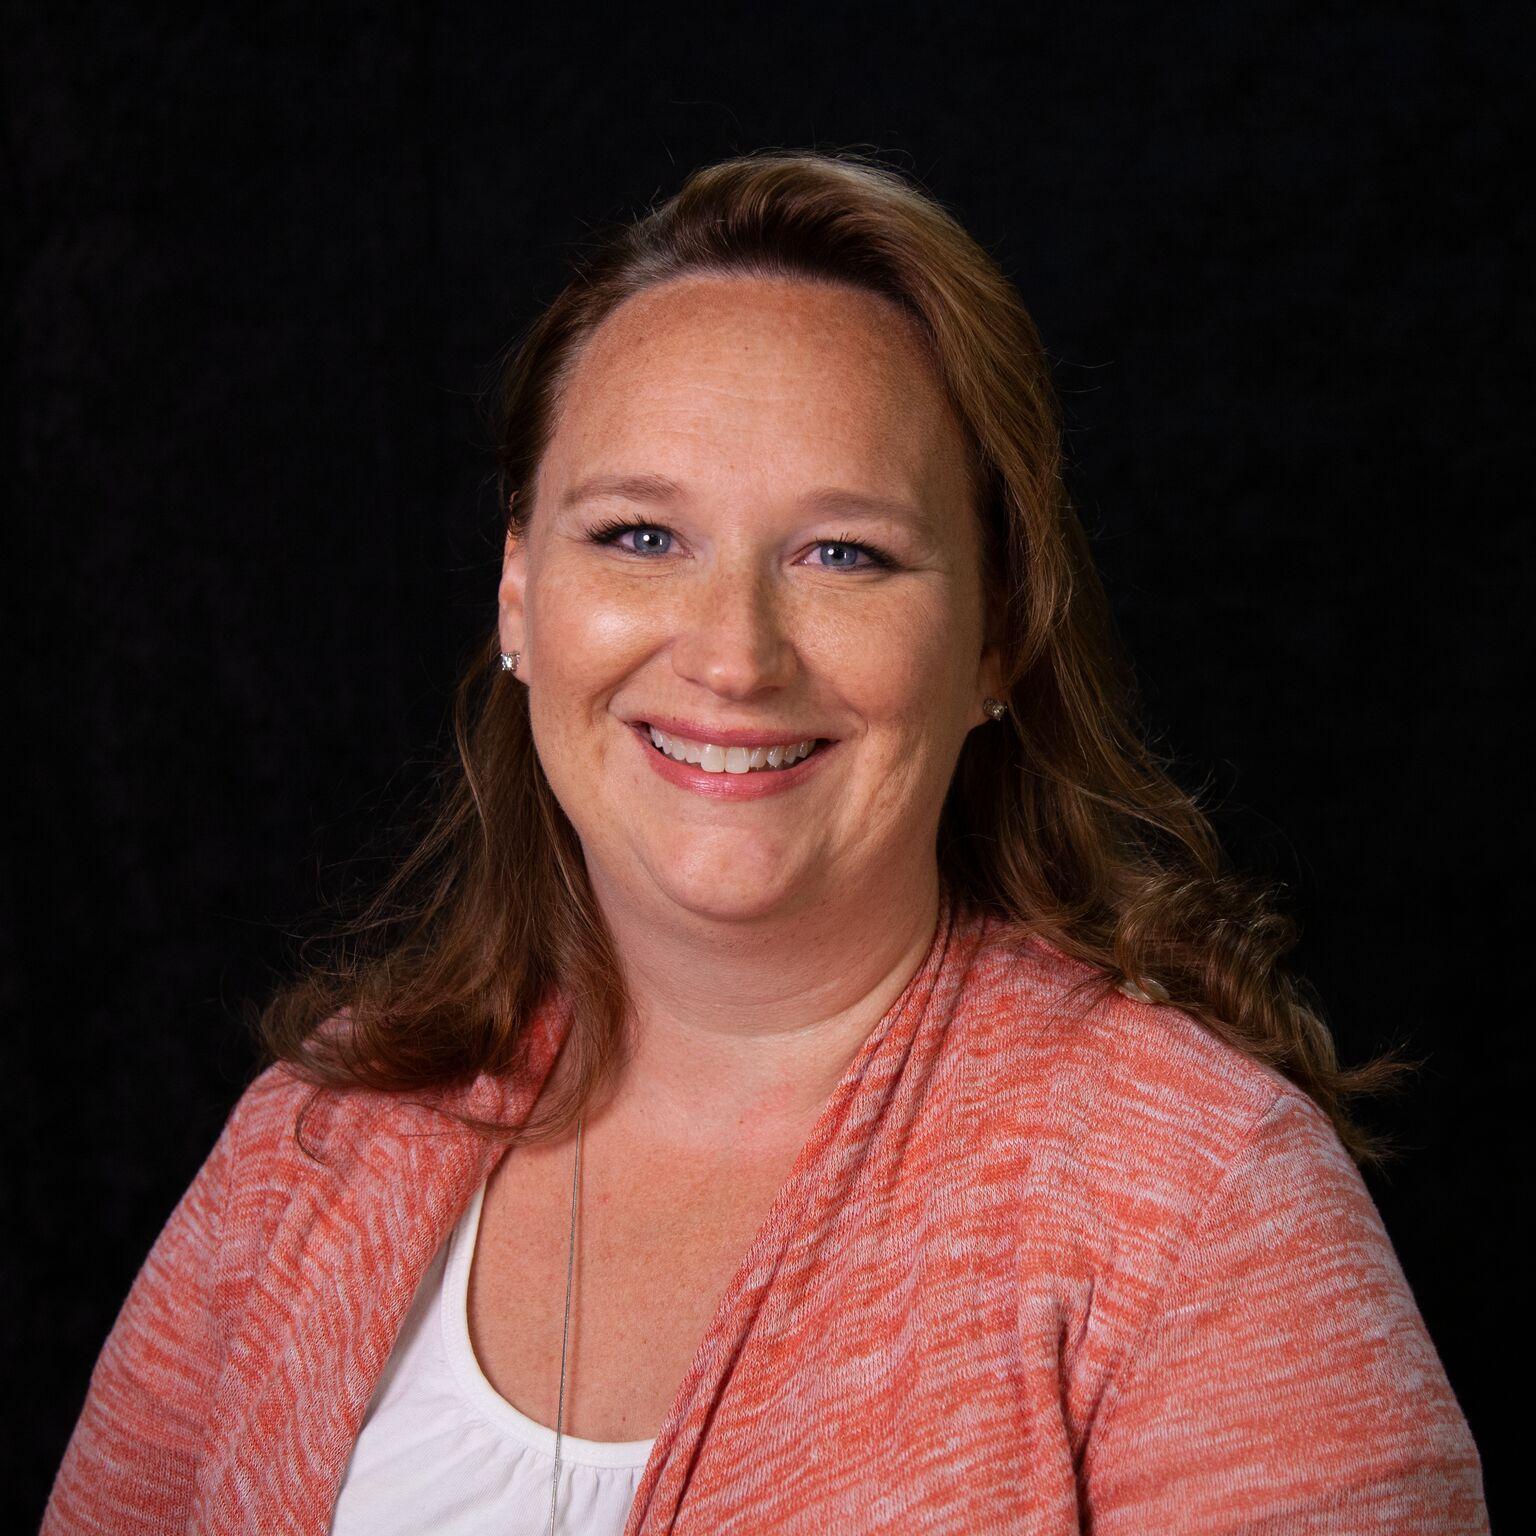 Kelly Cunningham, Senior Human Resource Manager